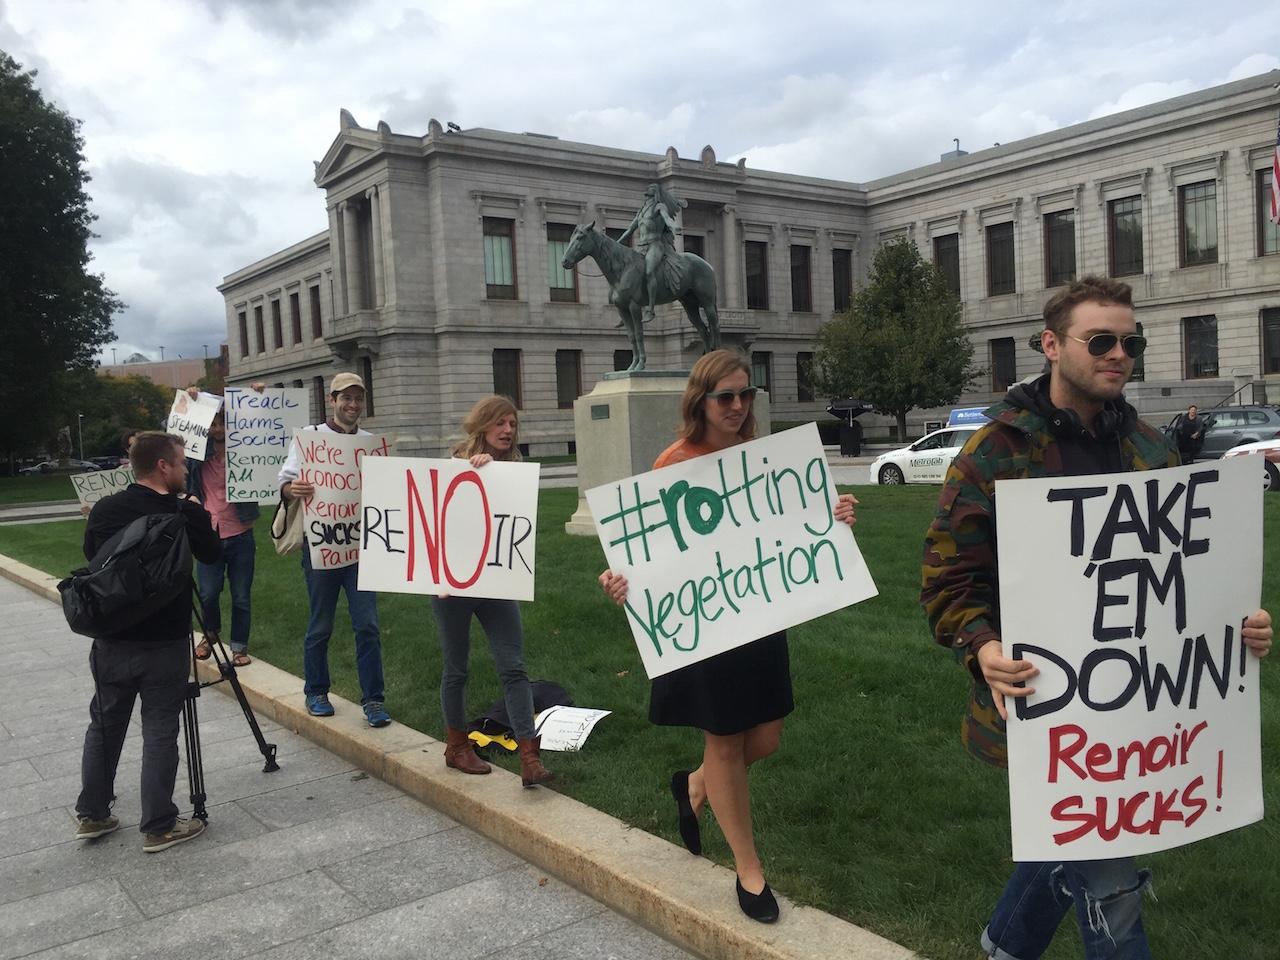 Protestors outside the MFA Boston on Monday (all photos courtesy Max Geller)